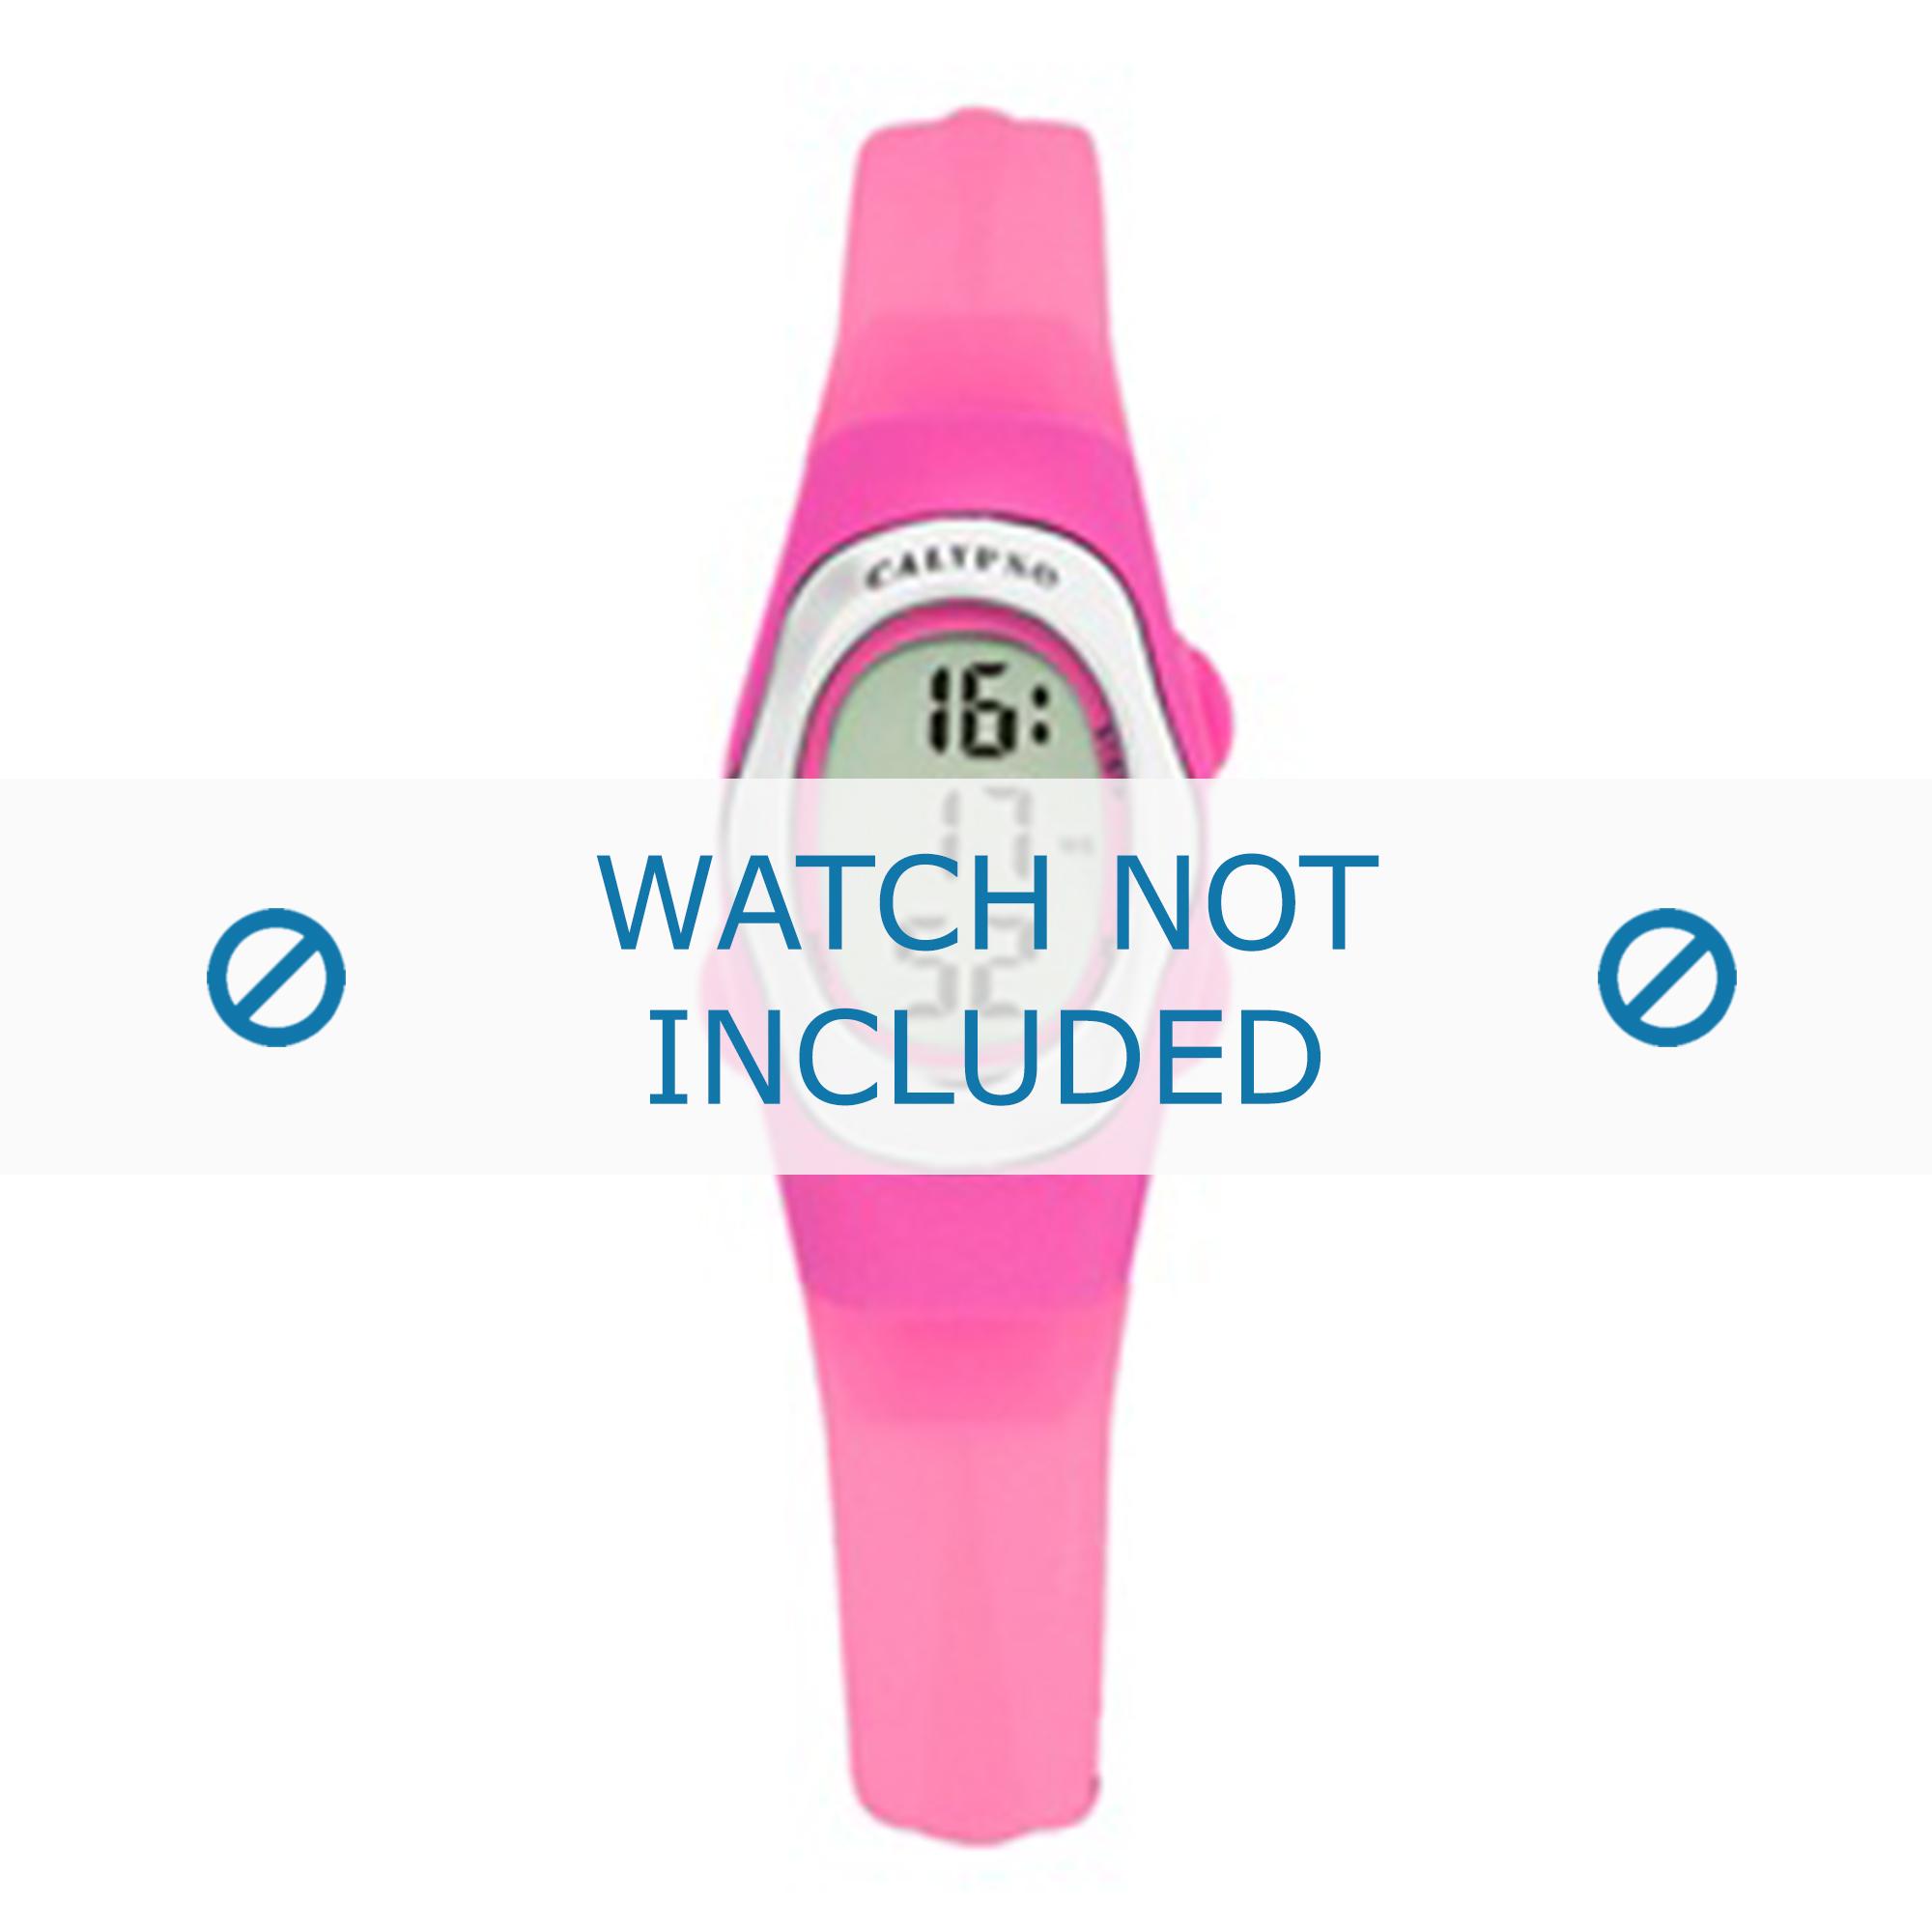 Calypso klockarmband K6018-B Gummi Rosa